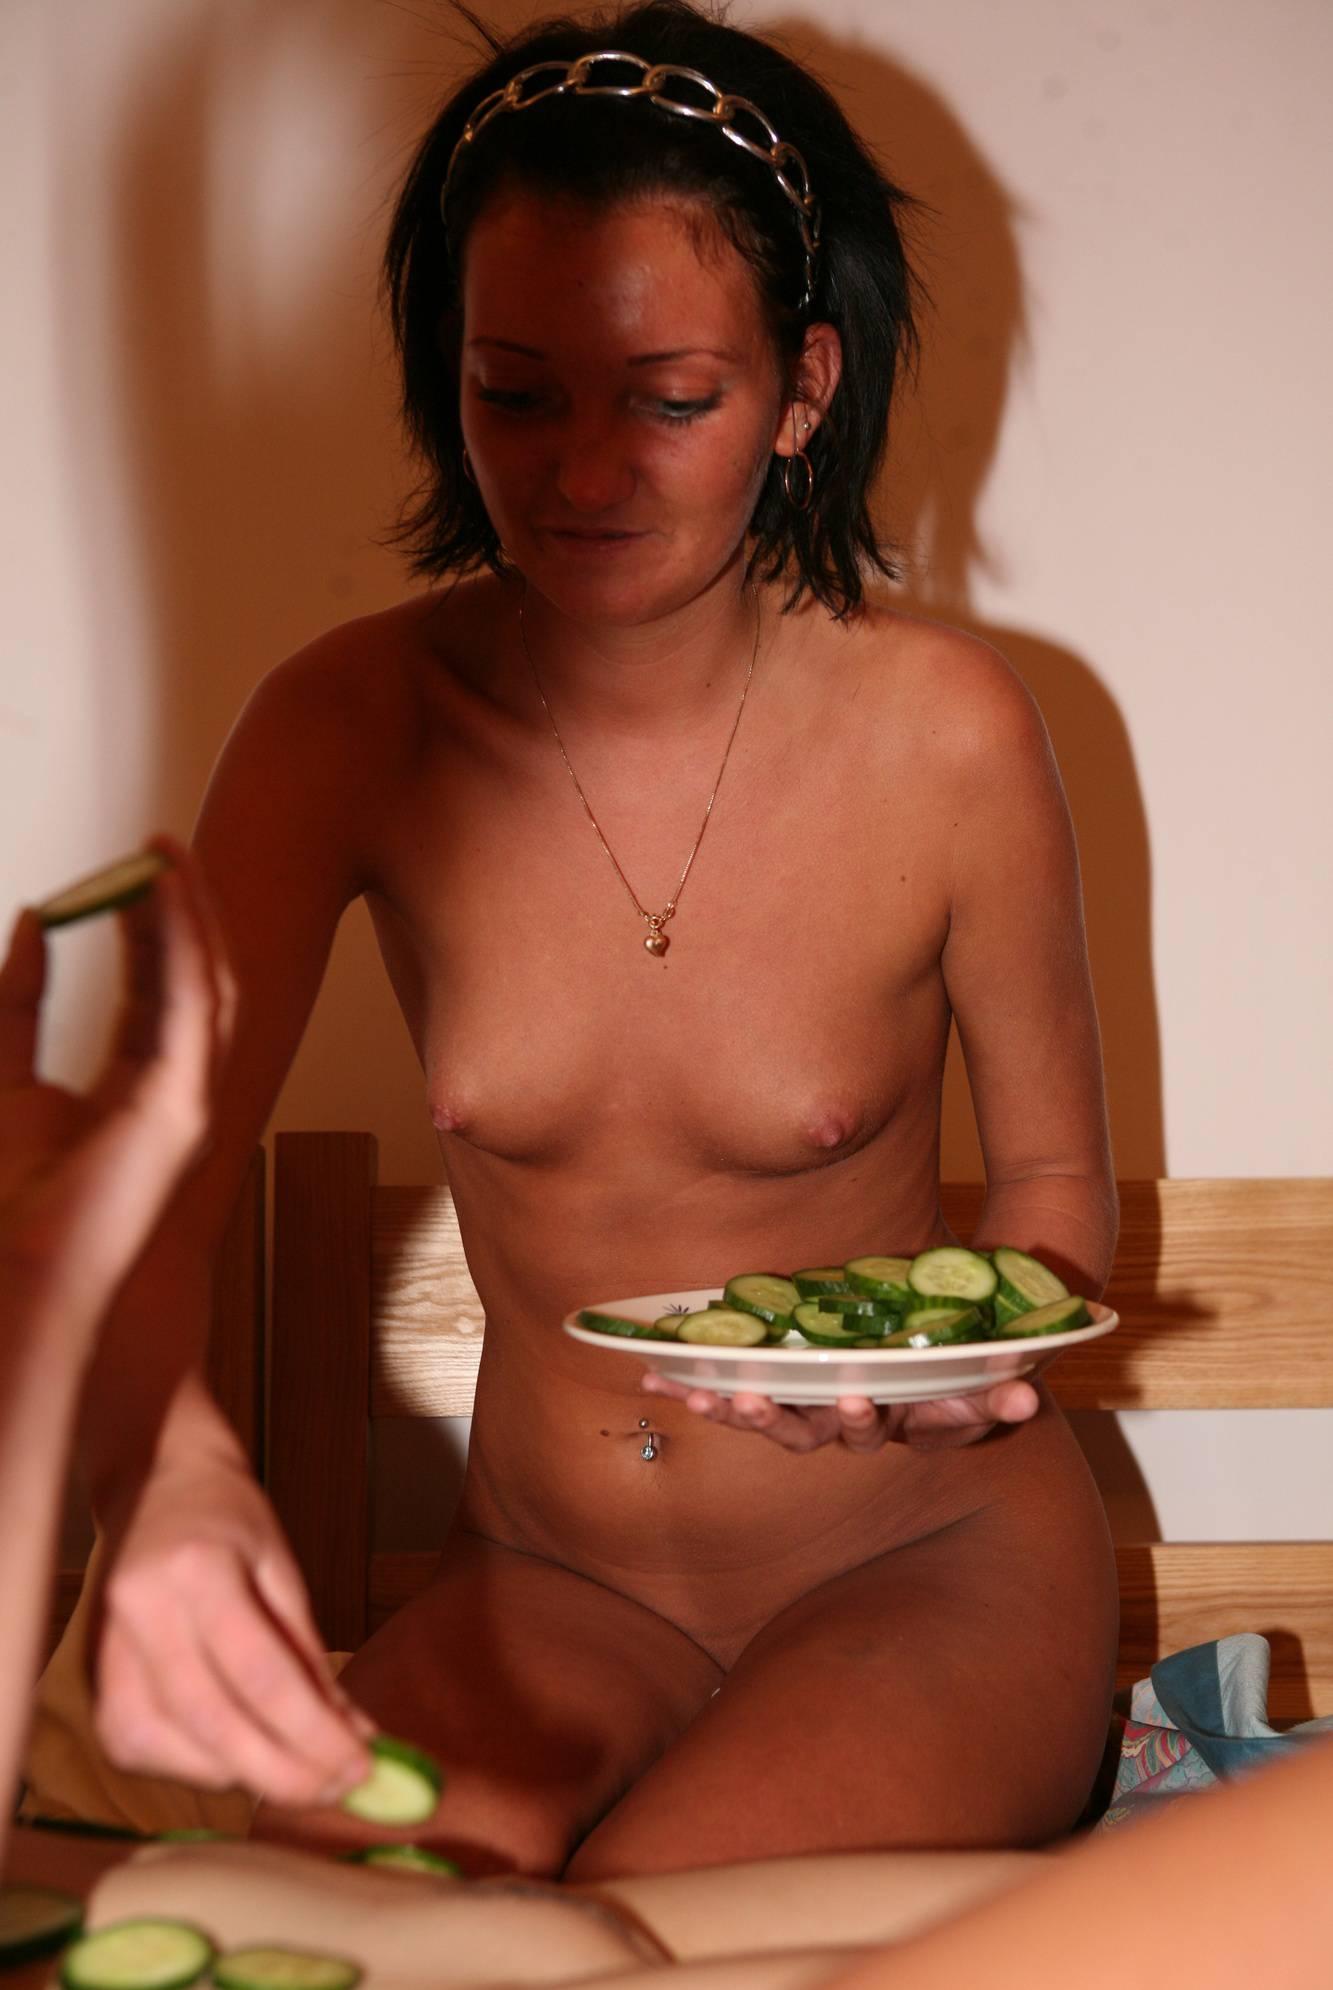 Nudist Pictures Jacuzzi Cucumber Mask - 2